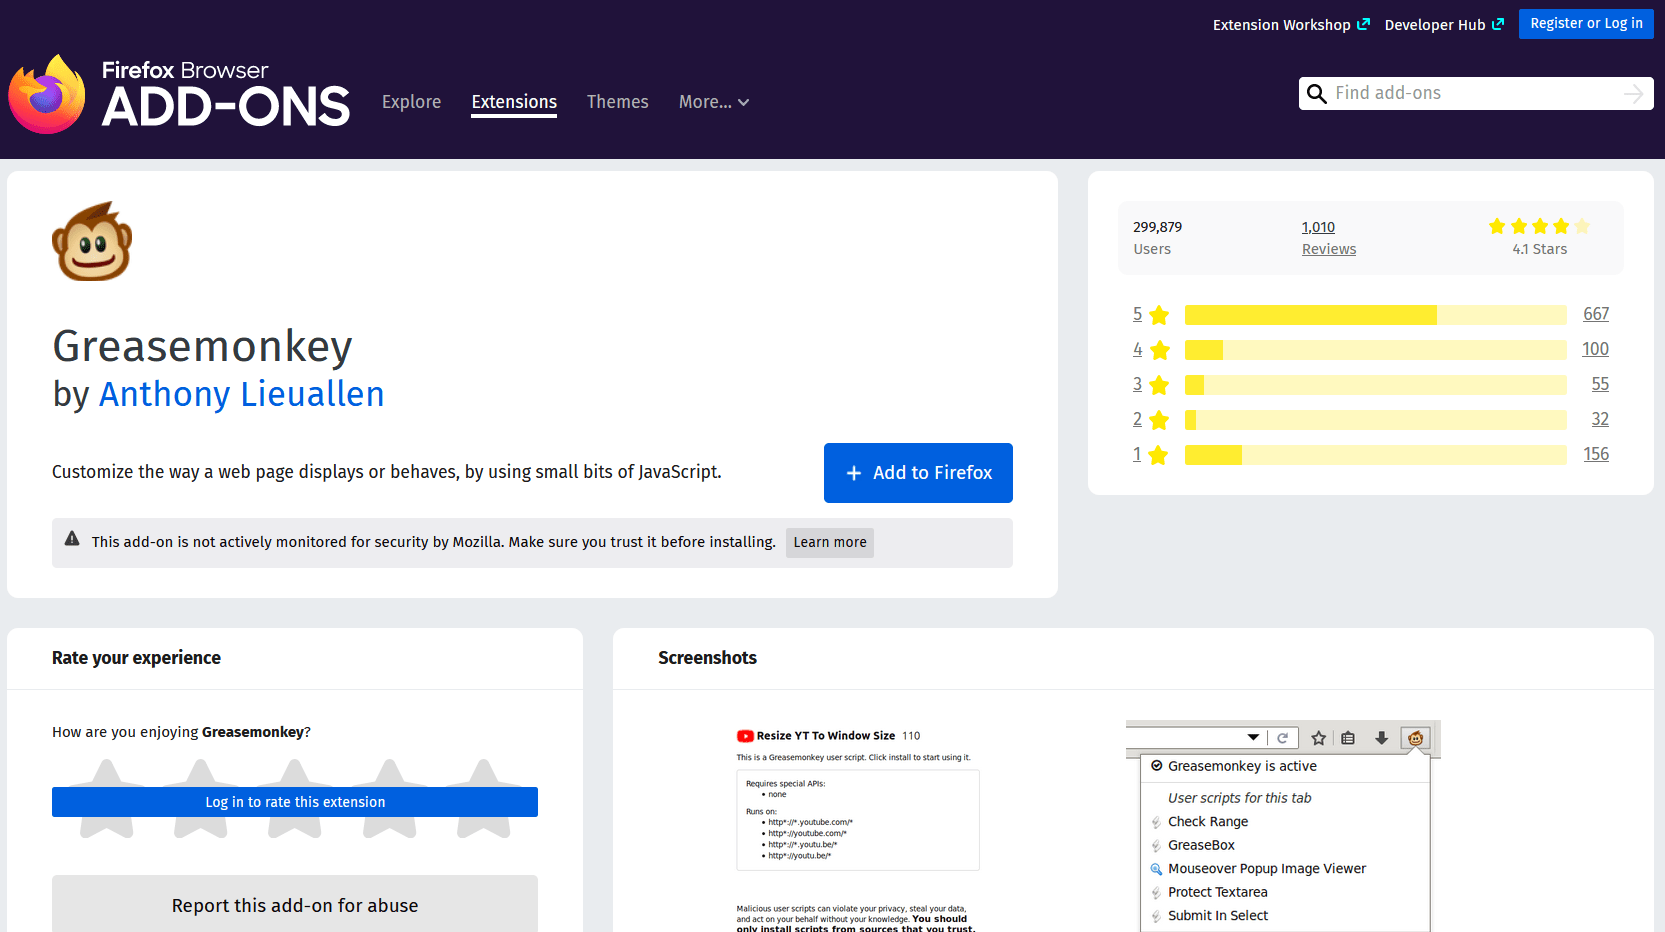 Greasemonkey Mozilla Firefox Add-on extension